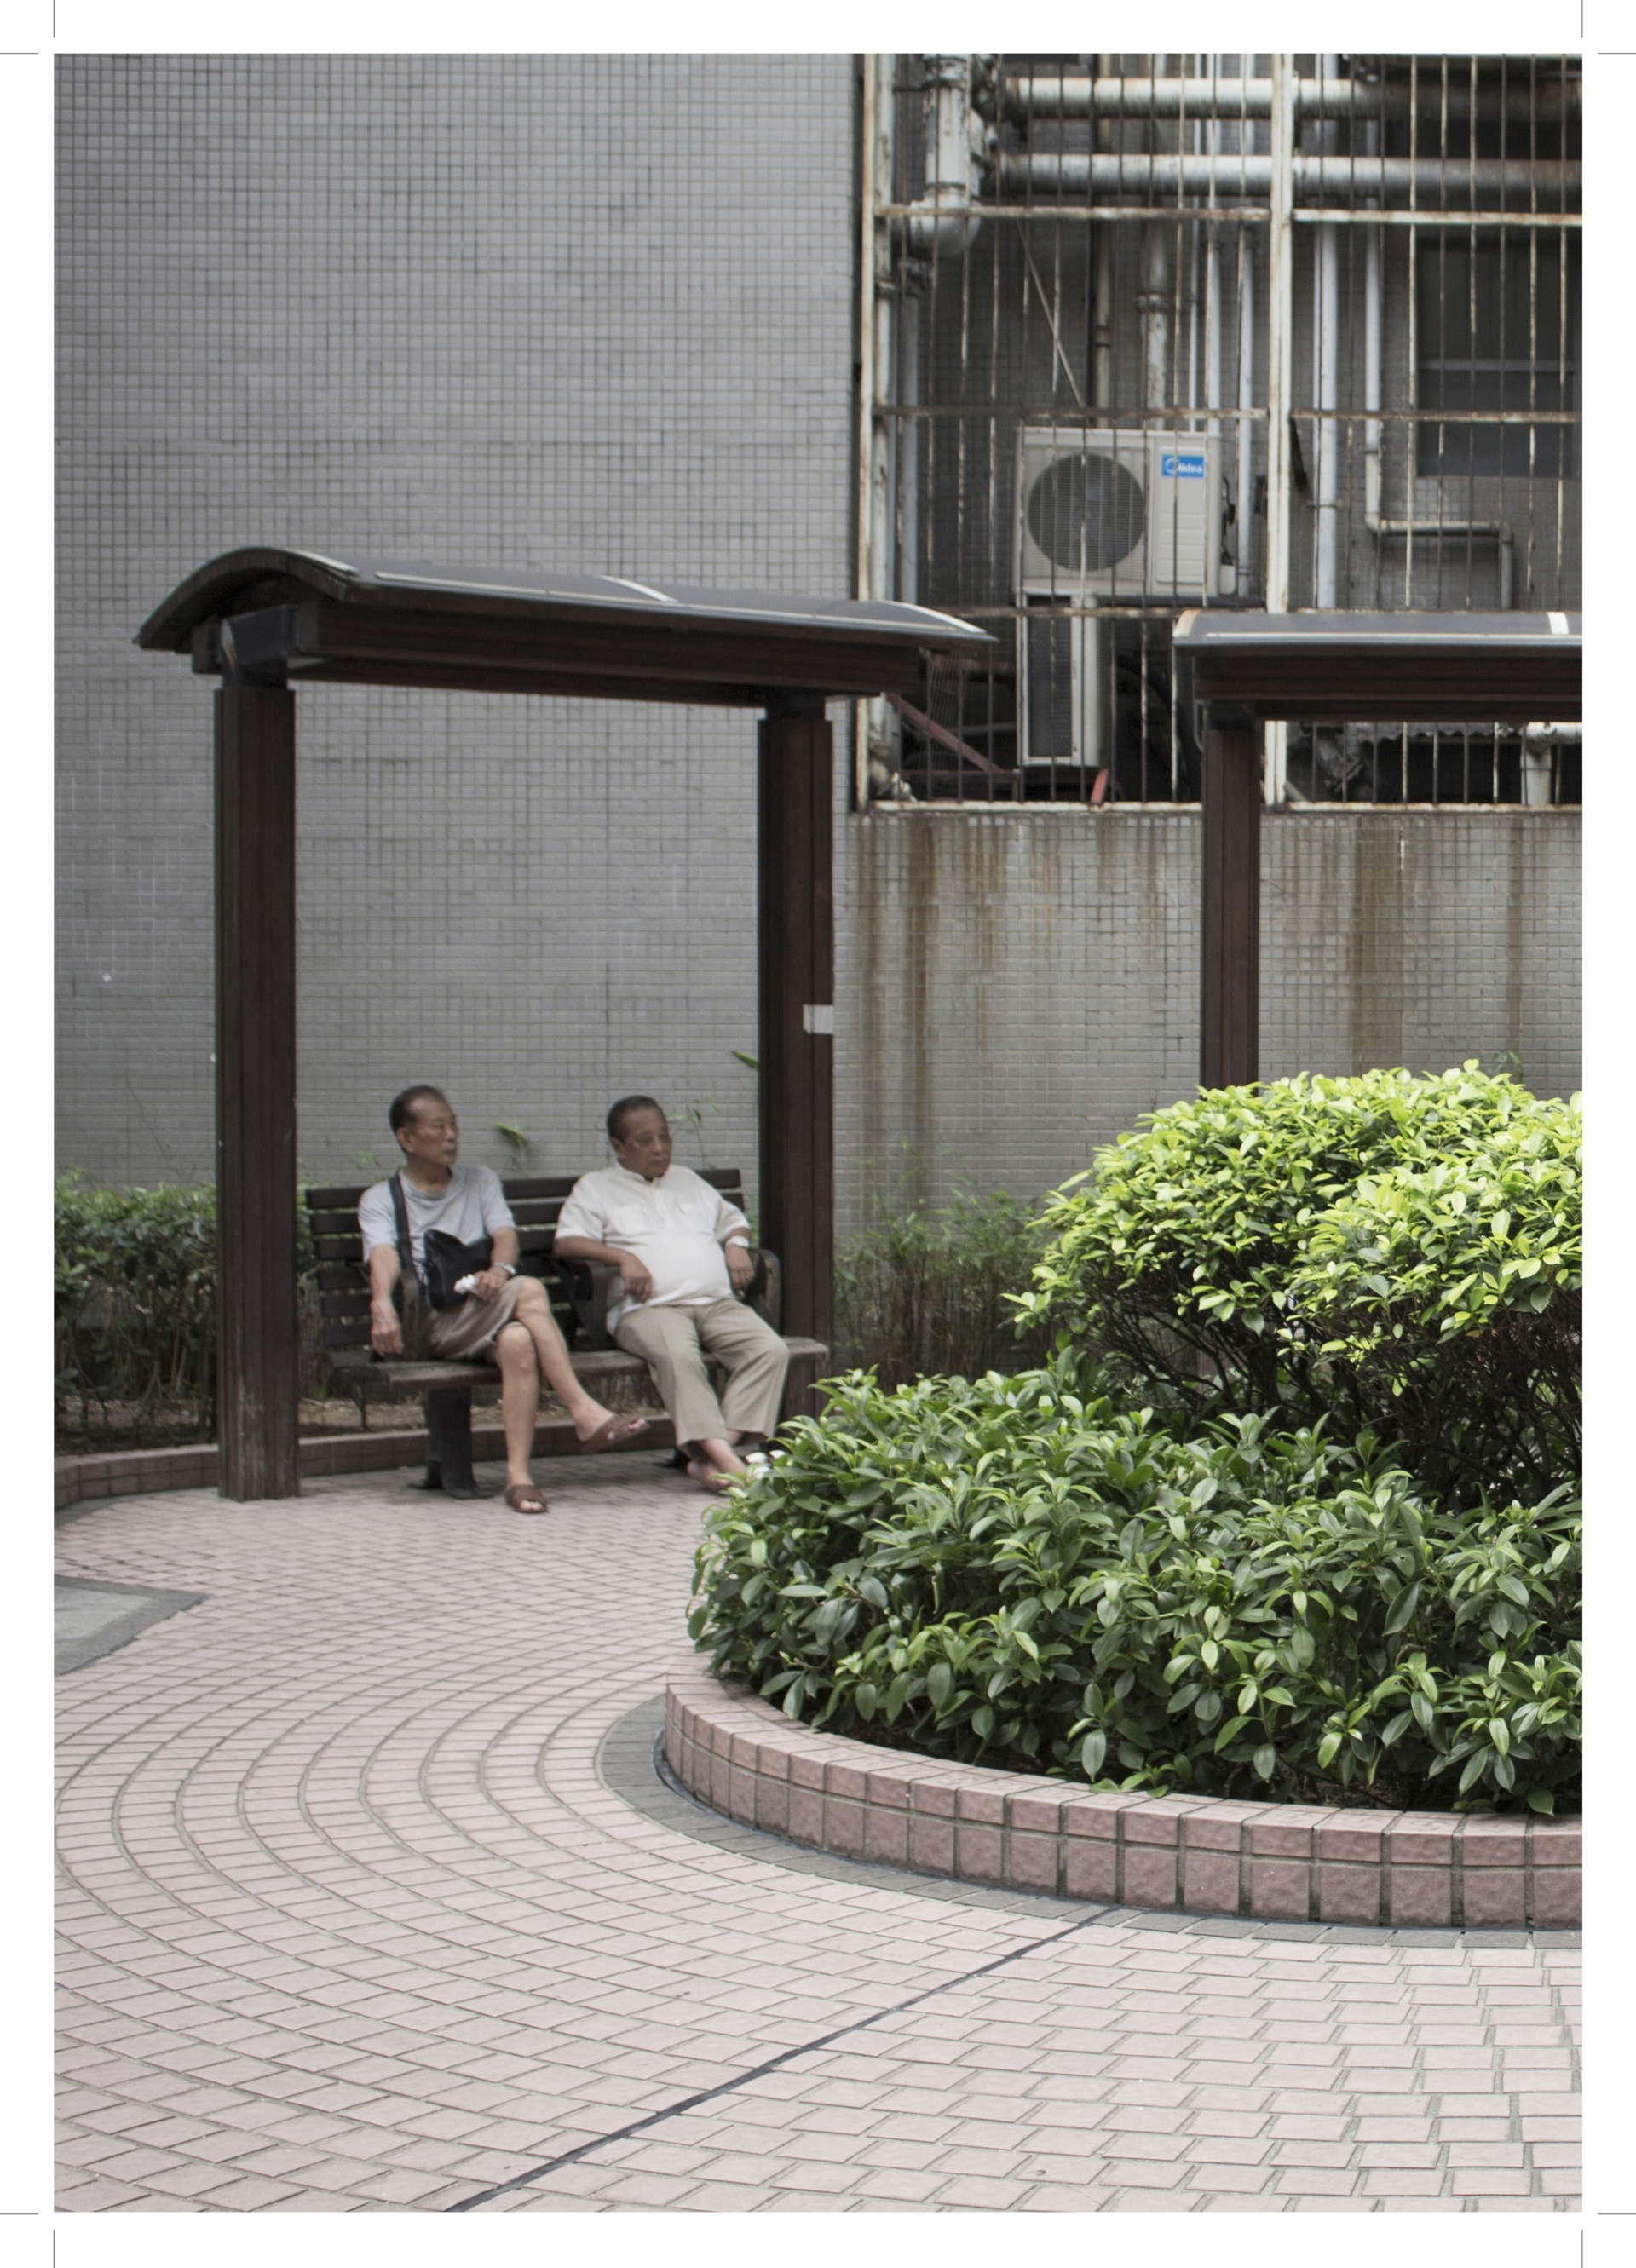 Enlarge Photo: Project 1 - (Inter)positioning: Portland Street Rest Garden. By ZHOU Yifan Mia.